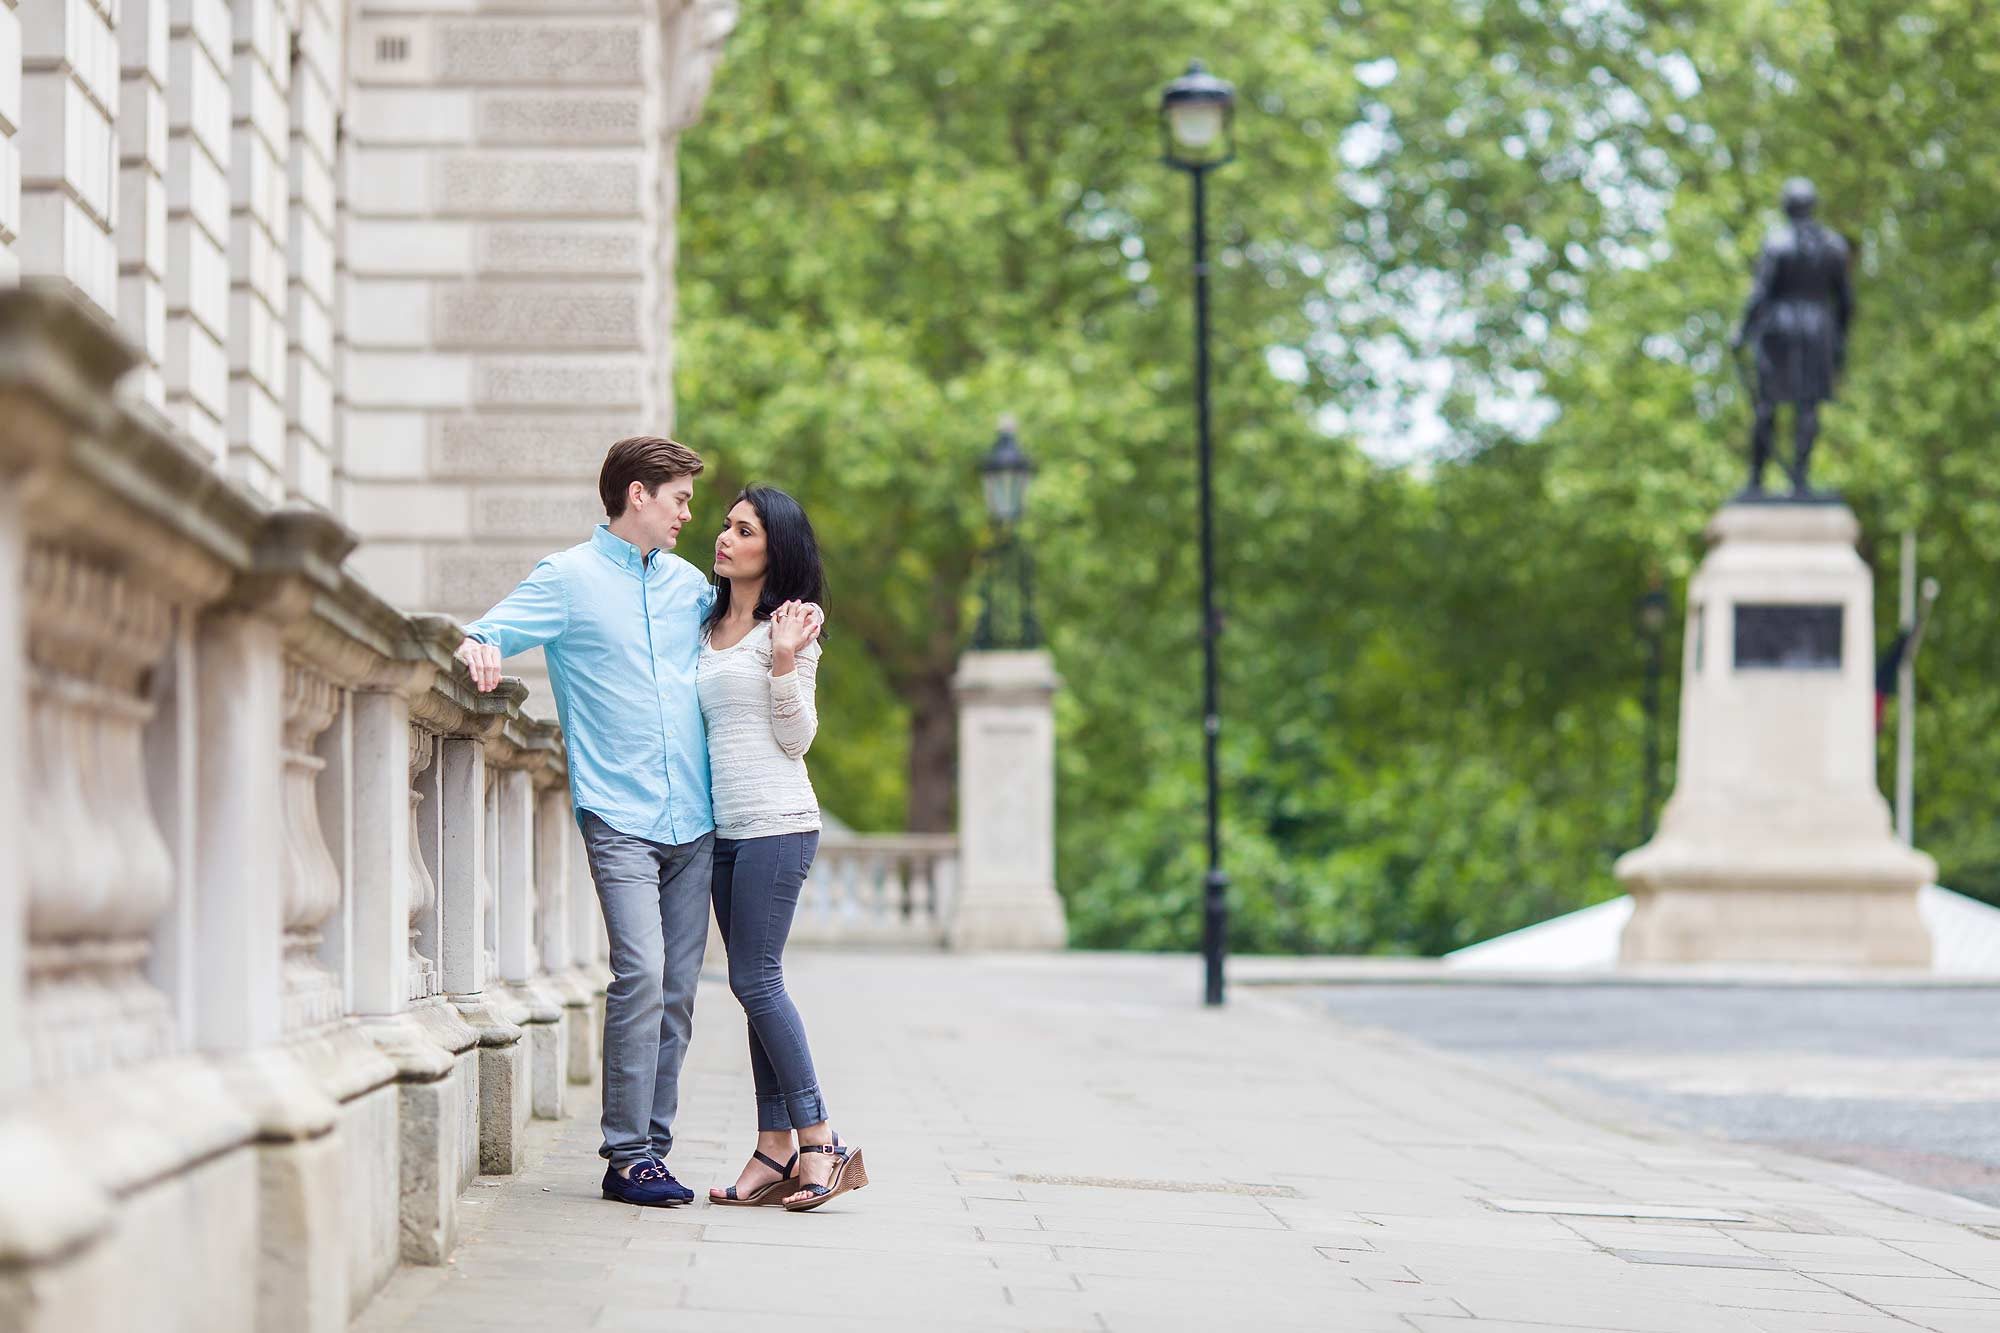 London photo shoot in summer